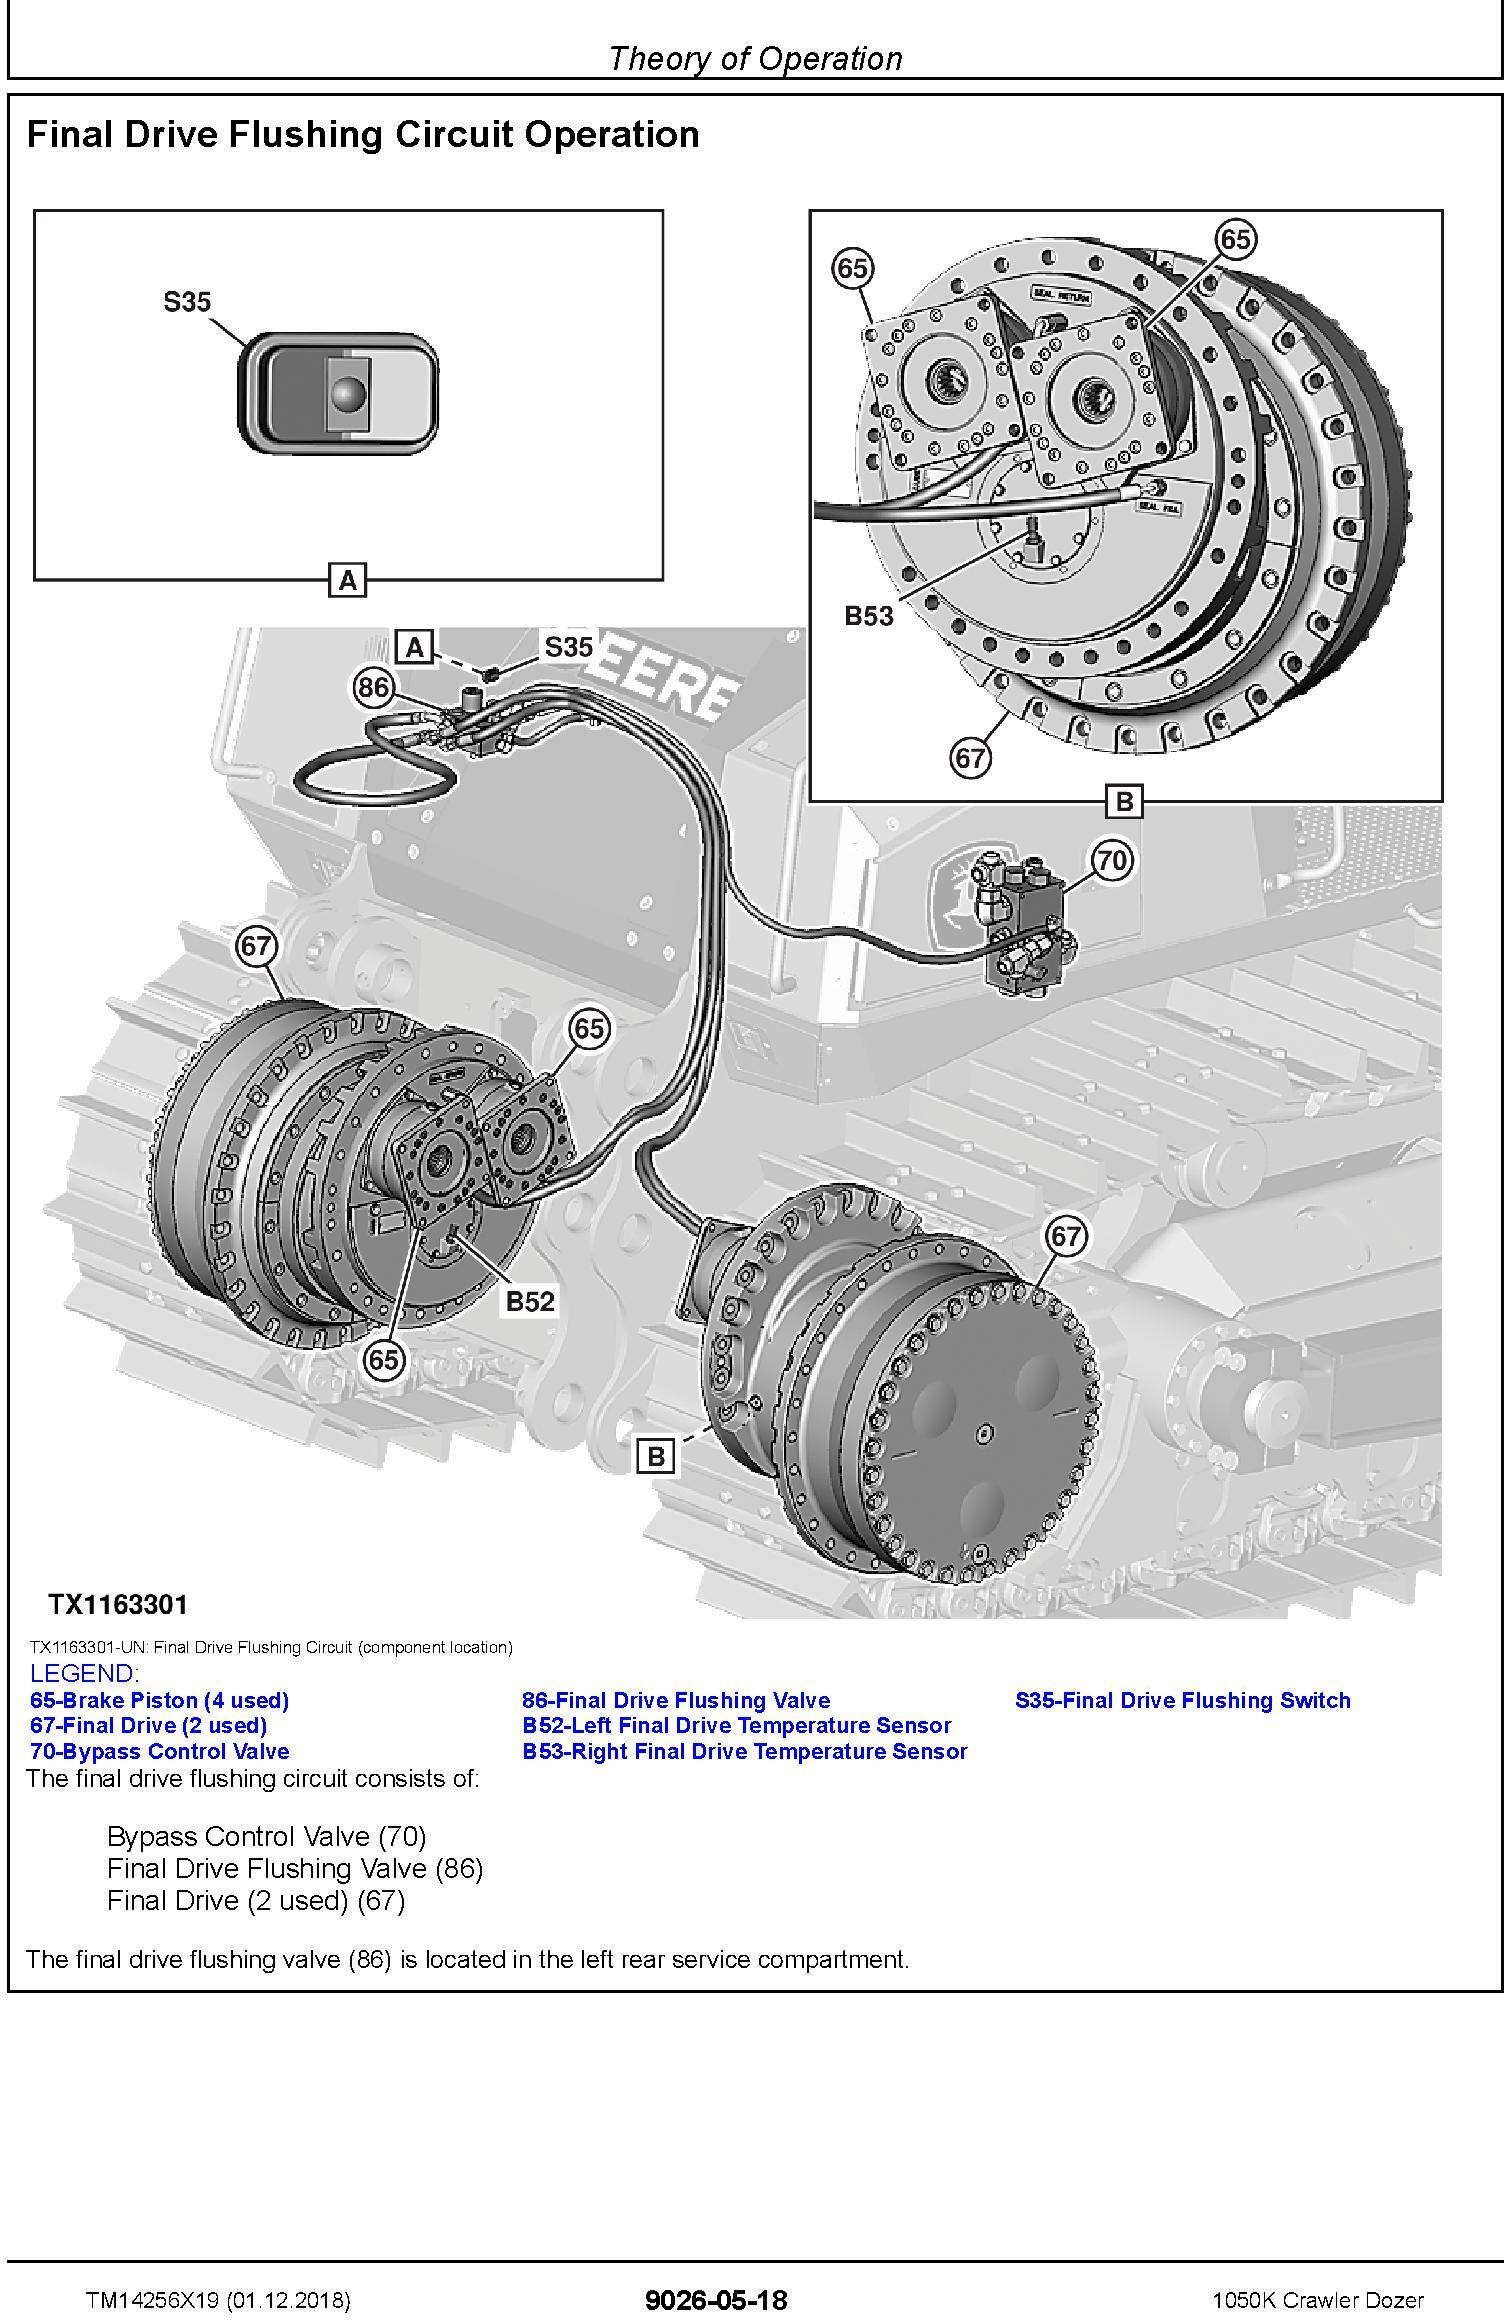 John Deere 1050K (SN. D268234-) Crawler Dozer Operation & Test Technical Manual (TM14256X19) - 3